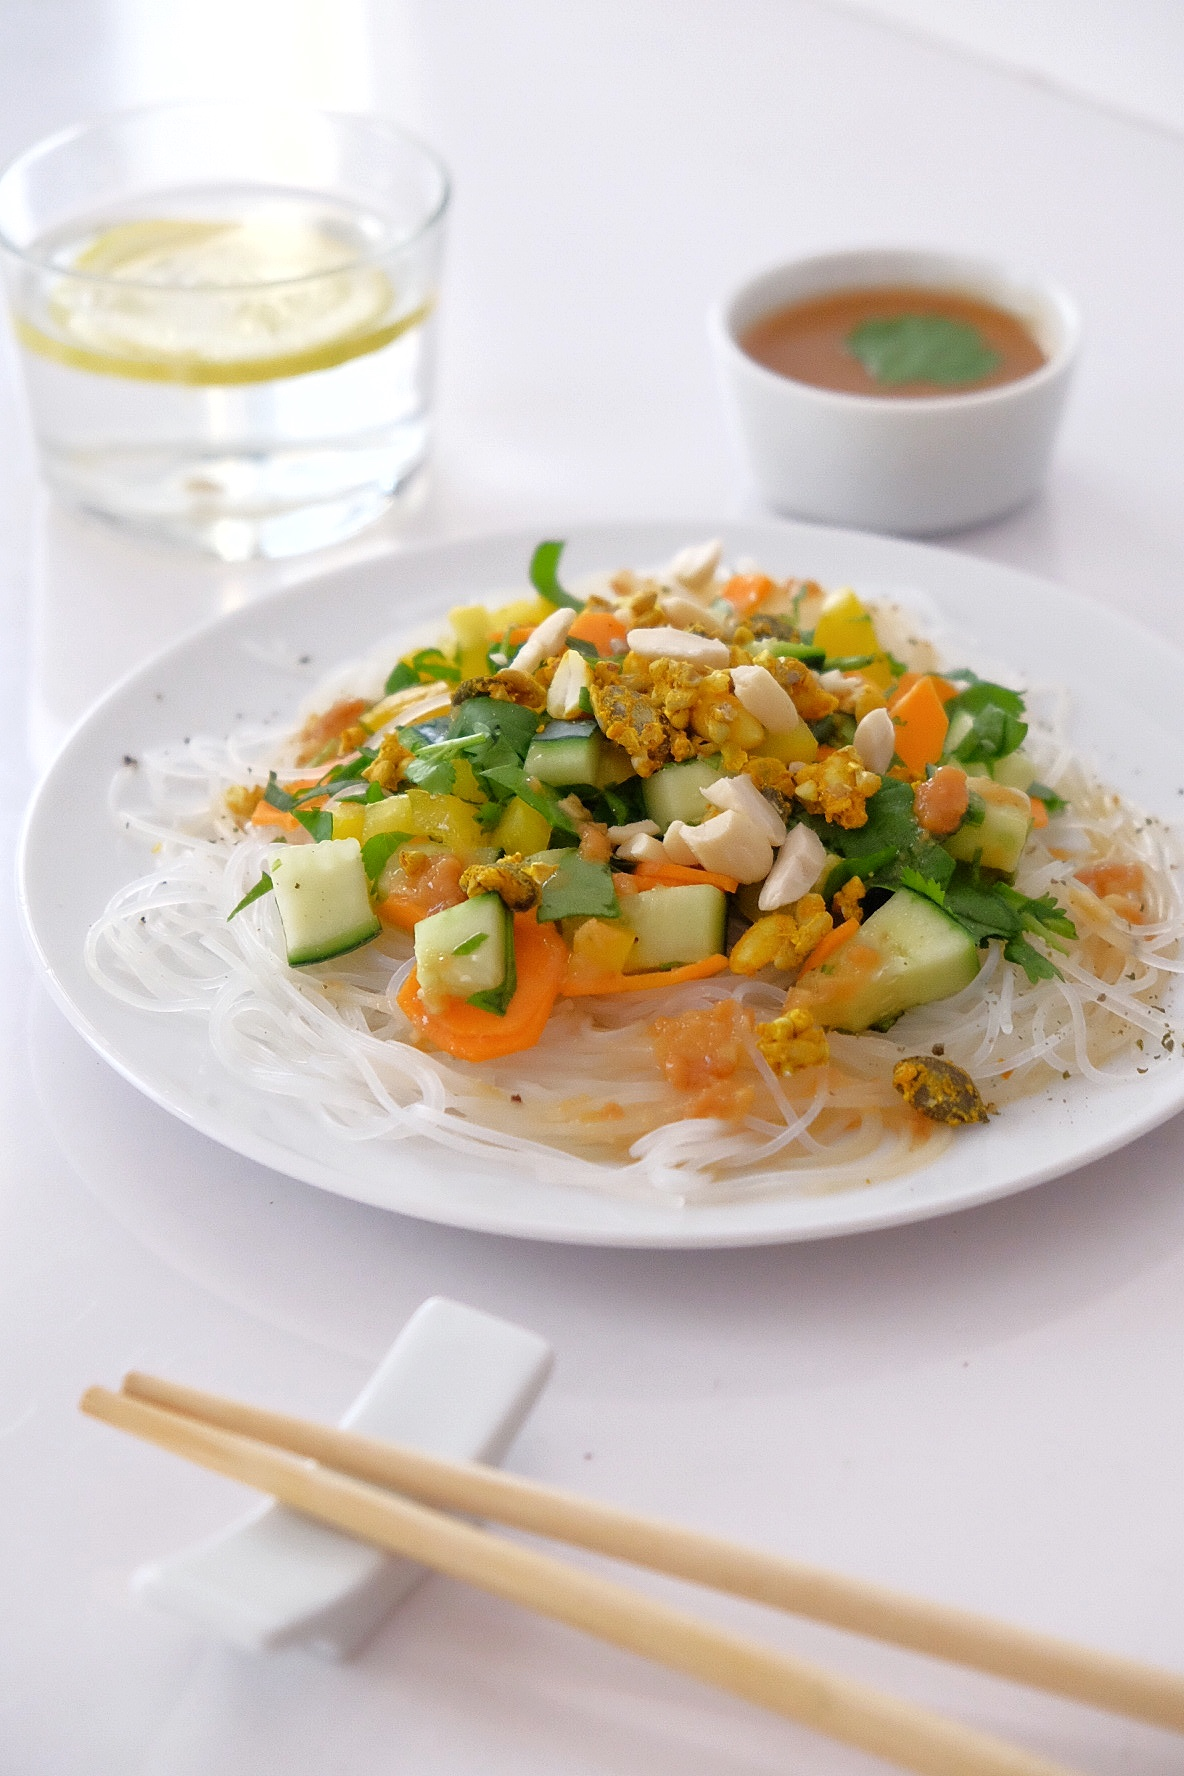 Ensalada de fideos de arroz con verduras crudas y salsa de cacahuetes